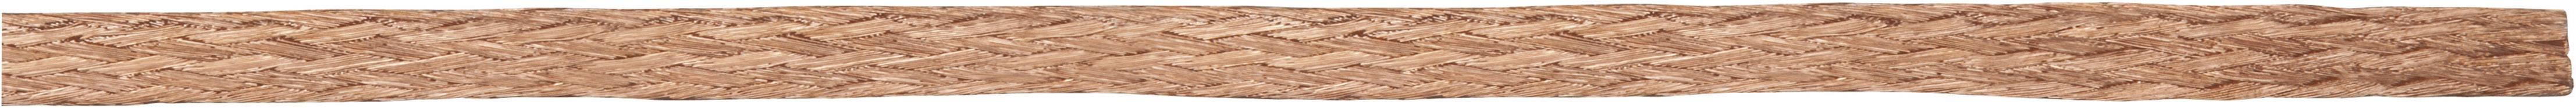 Uzemňovací pletivo LappKabel 2,5mm² EL-CU (49900253)